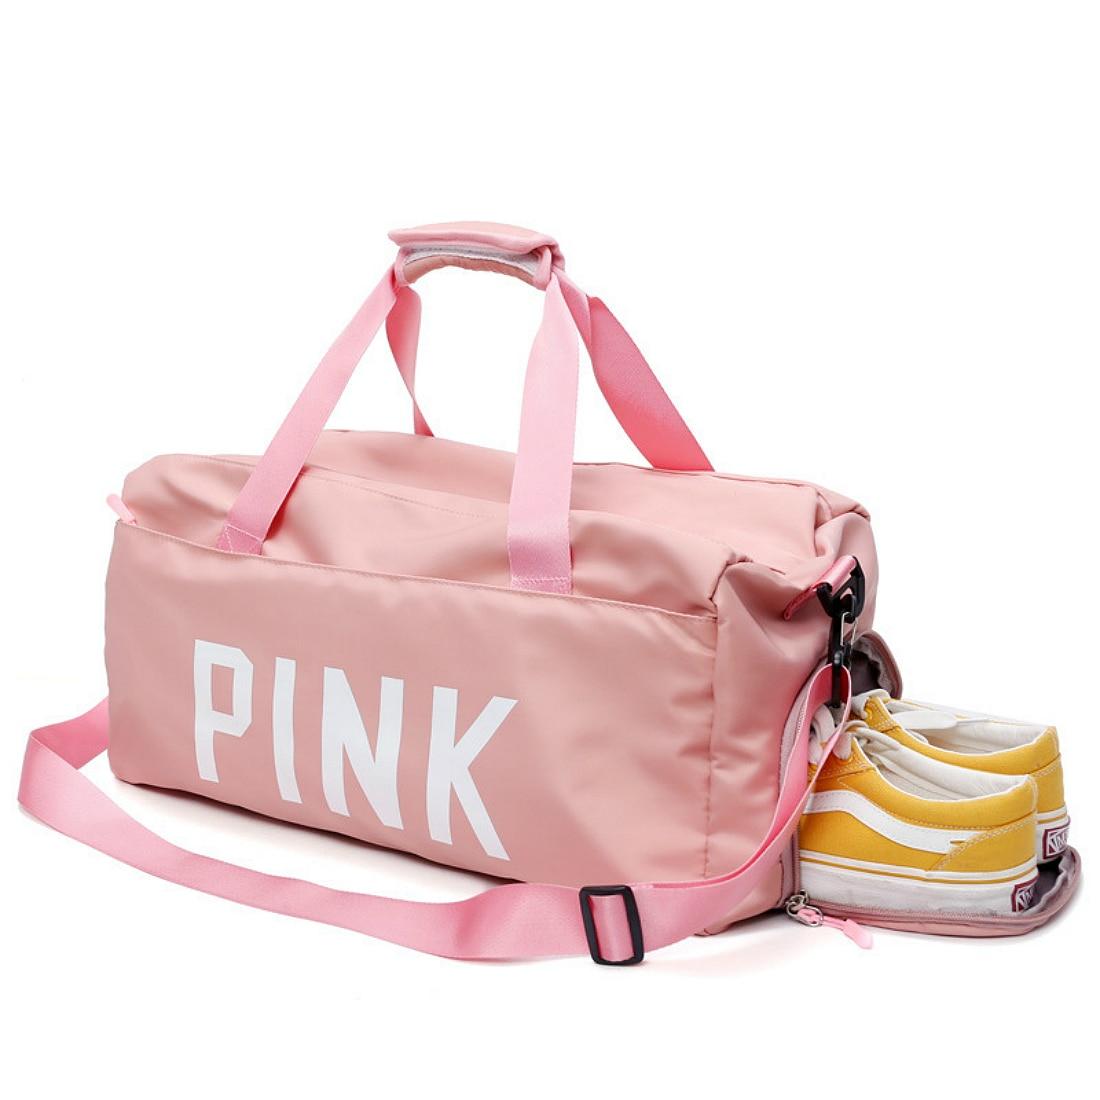 abd26a4c6c03 2018 black pink Print Outdoor Waterproof Nylon Sports Gym Bags Men Women  Girls Training Fitness Travel